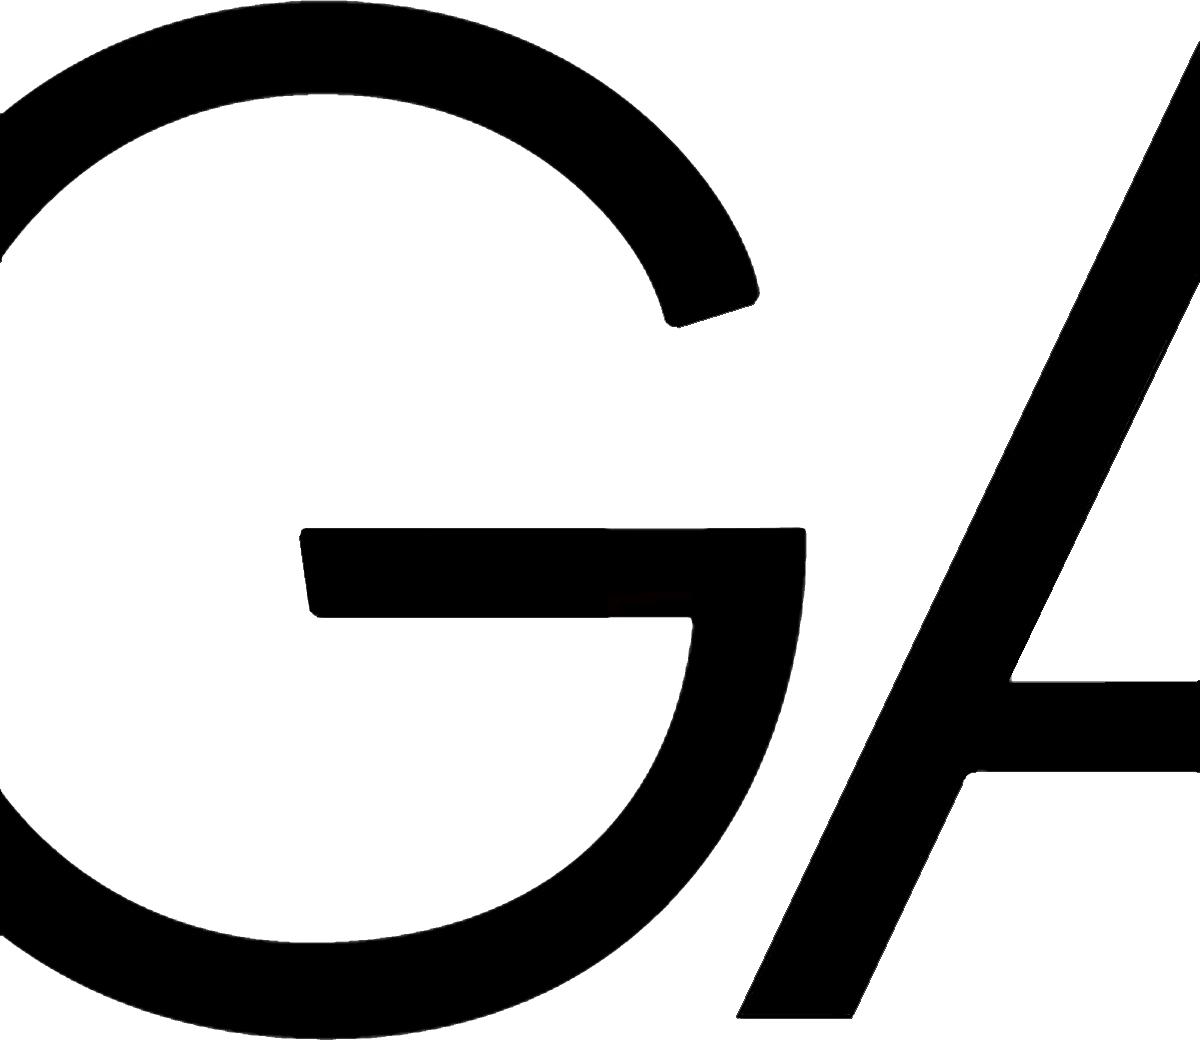 GA_figure_logo.png